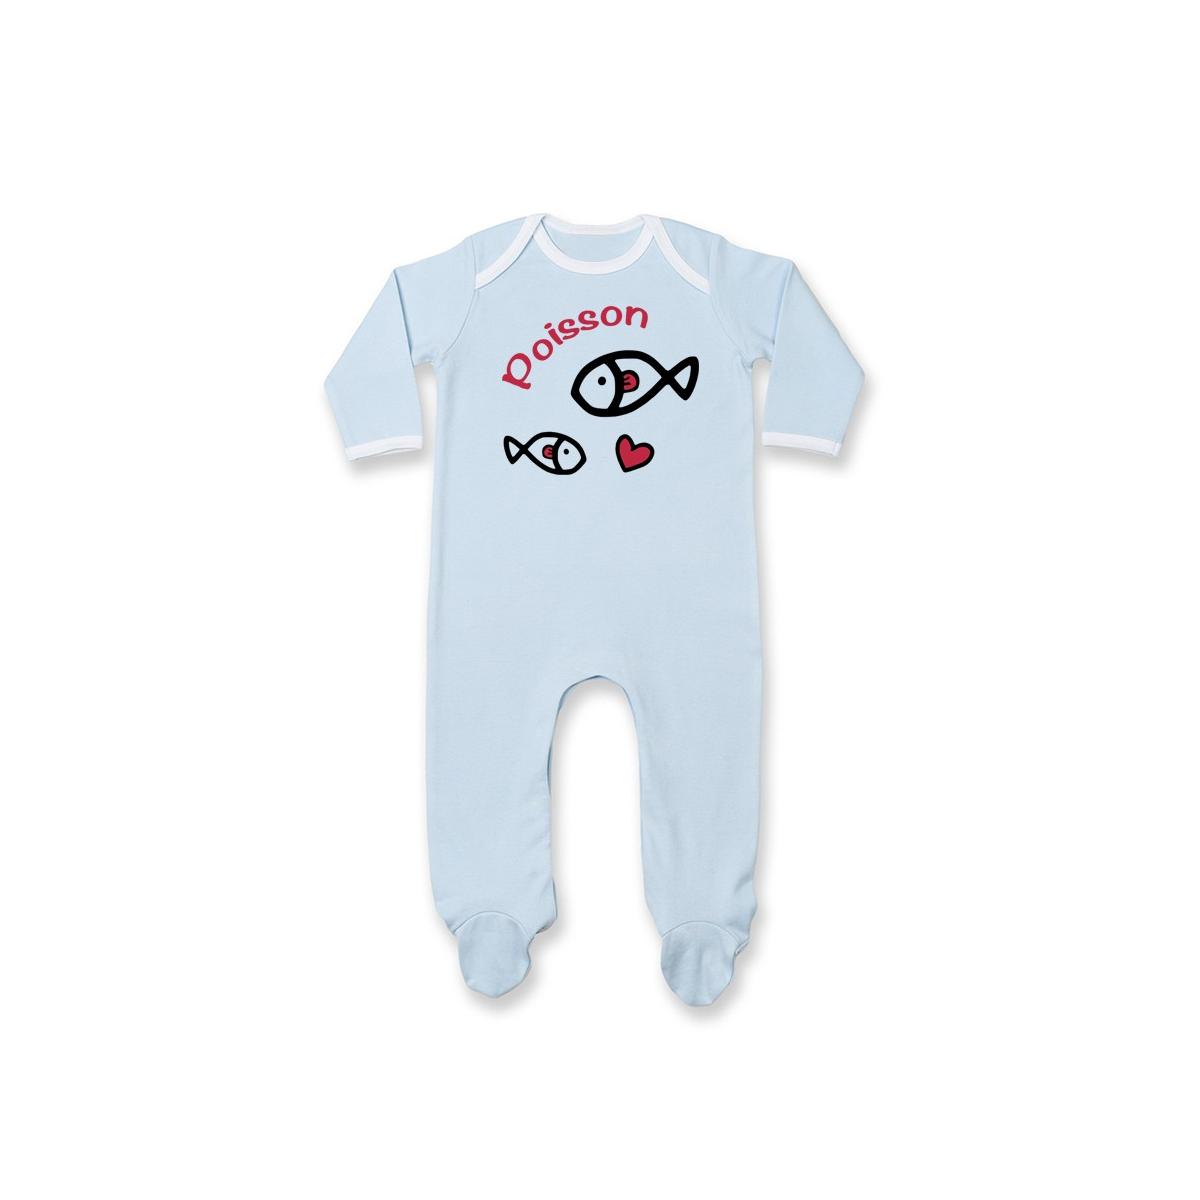 Pyjama bébé Signes Astrologiques : Poisson